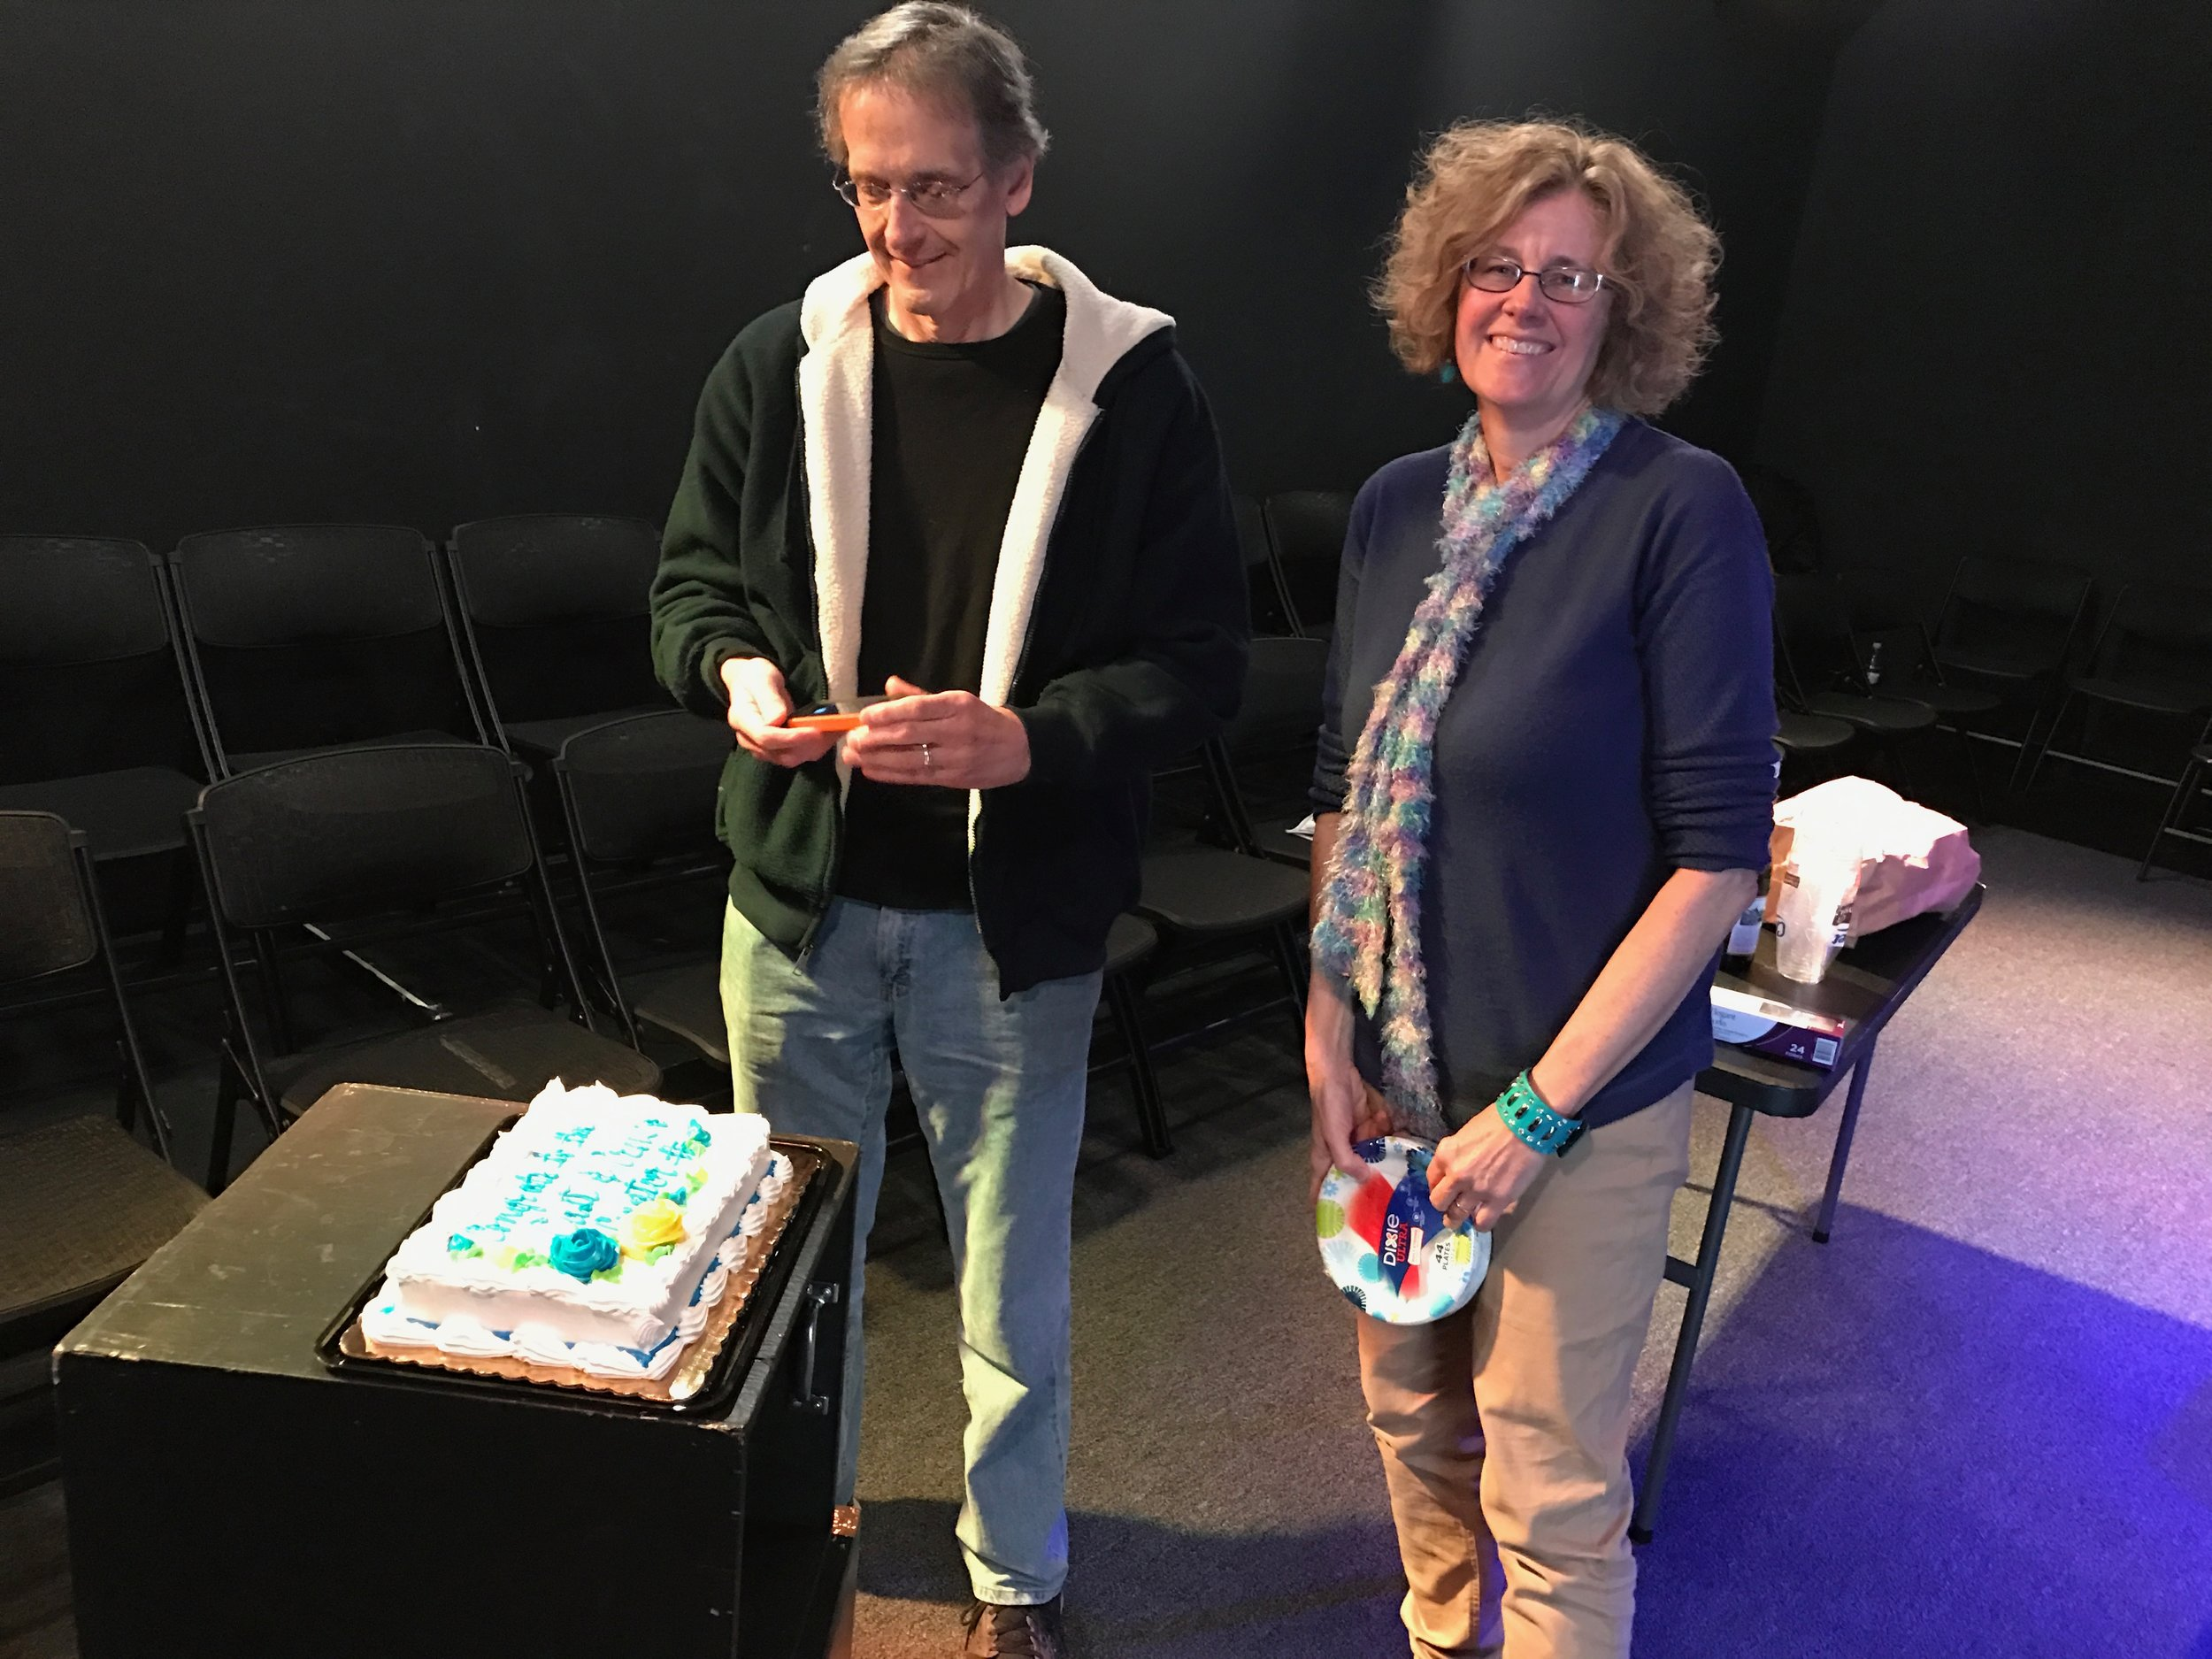 Robert Bucchianeri and Paula Schnepp – Nick's wonderful parents.